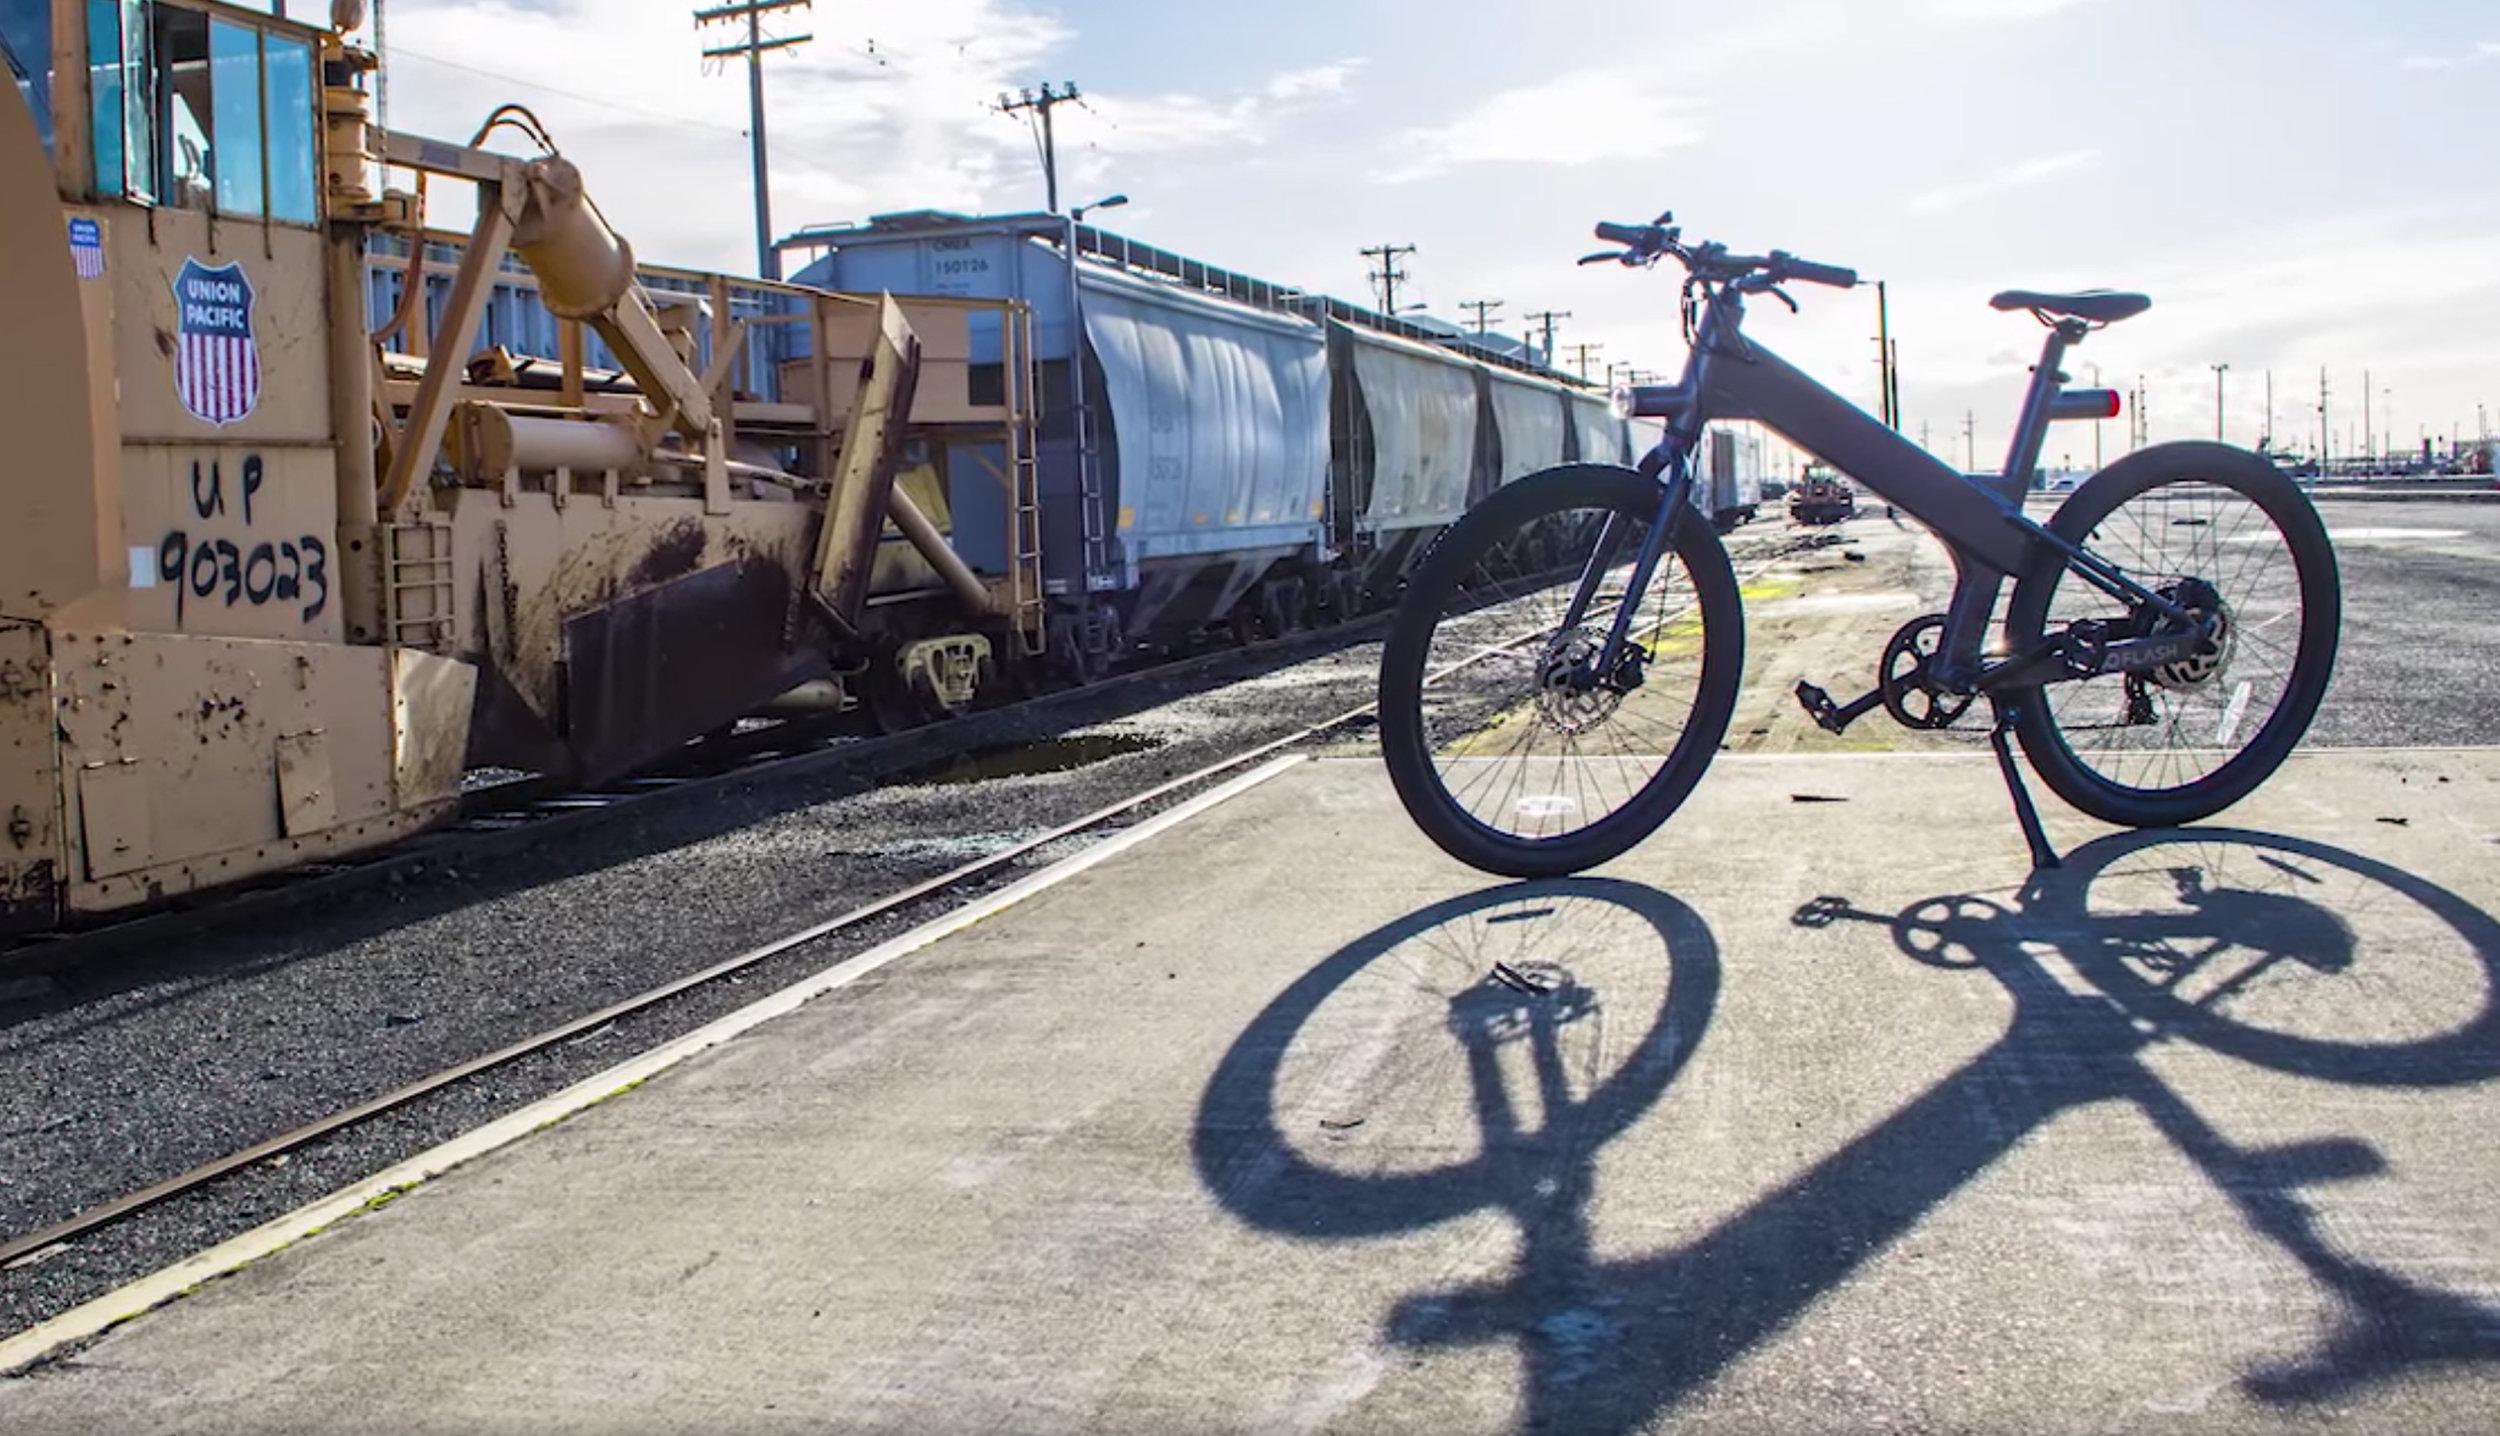 electrified-reviews-flash-v1-electric-bike-review-train.jpg